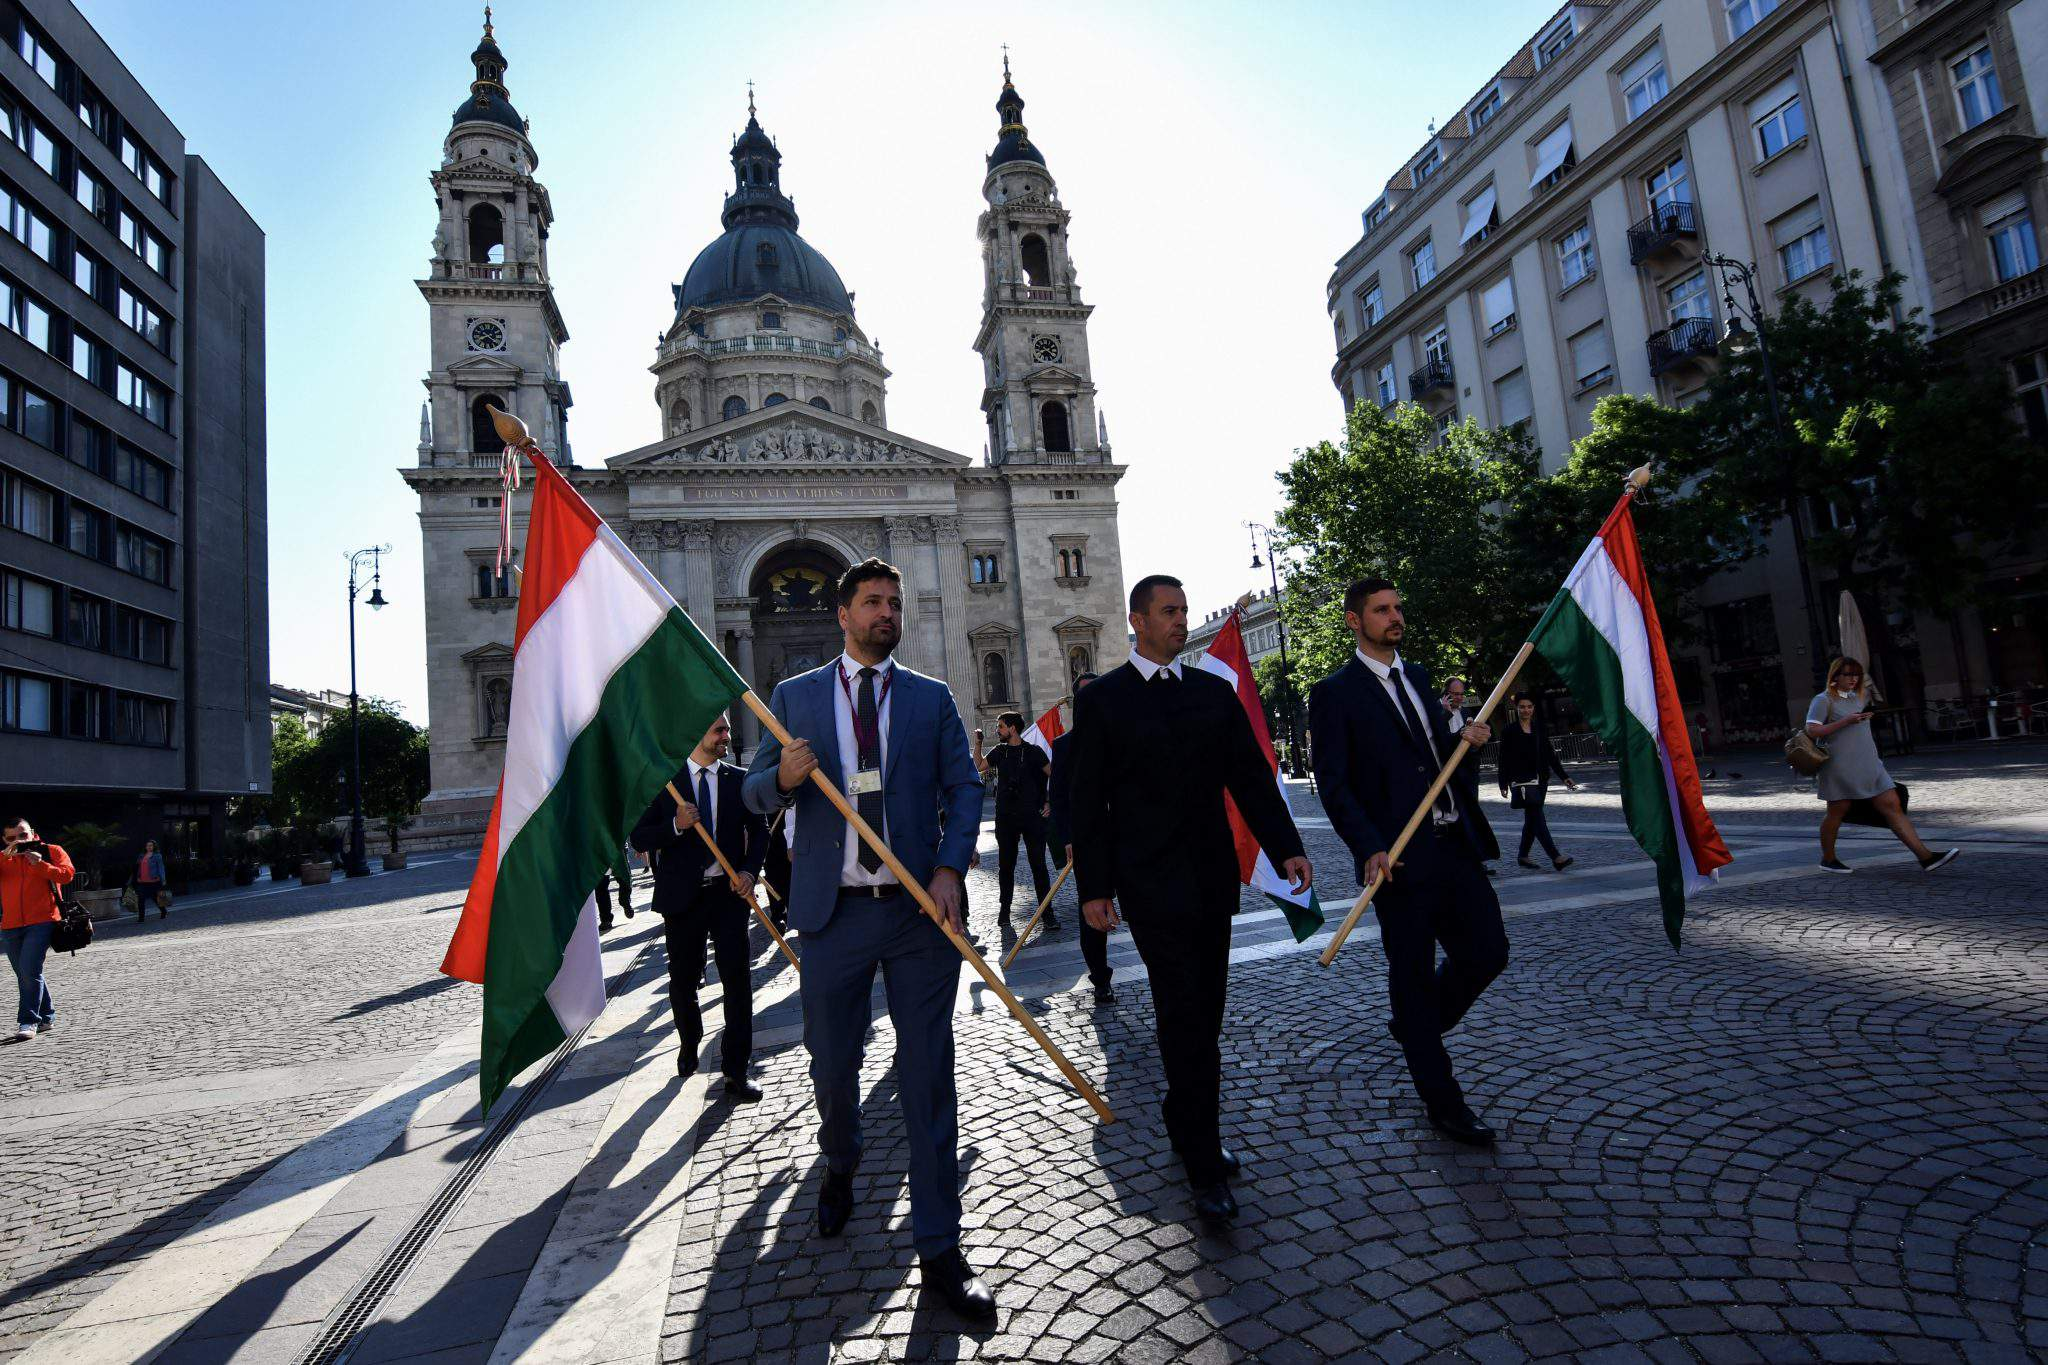 Jobbik party Hungary opposition